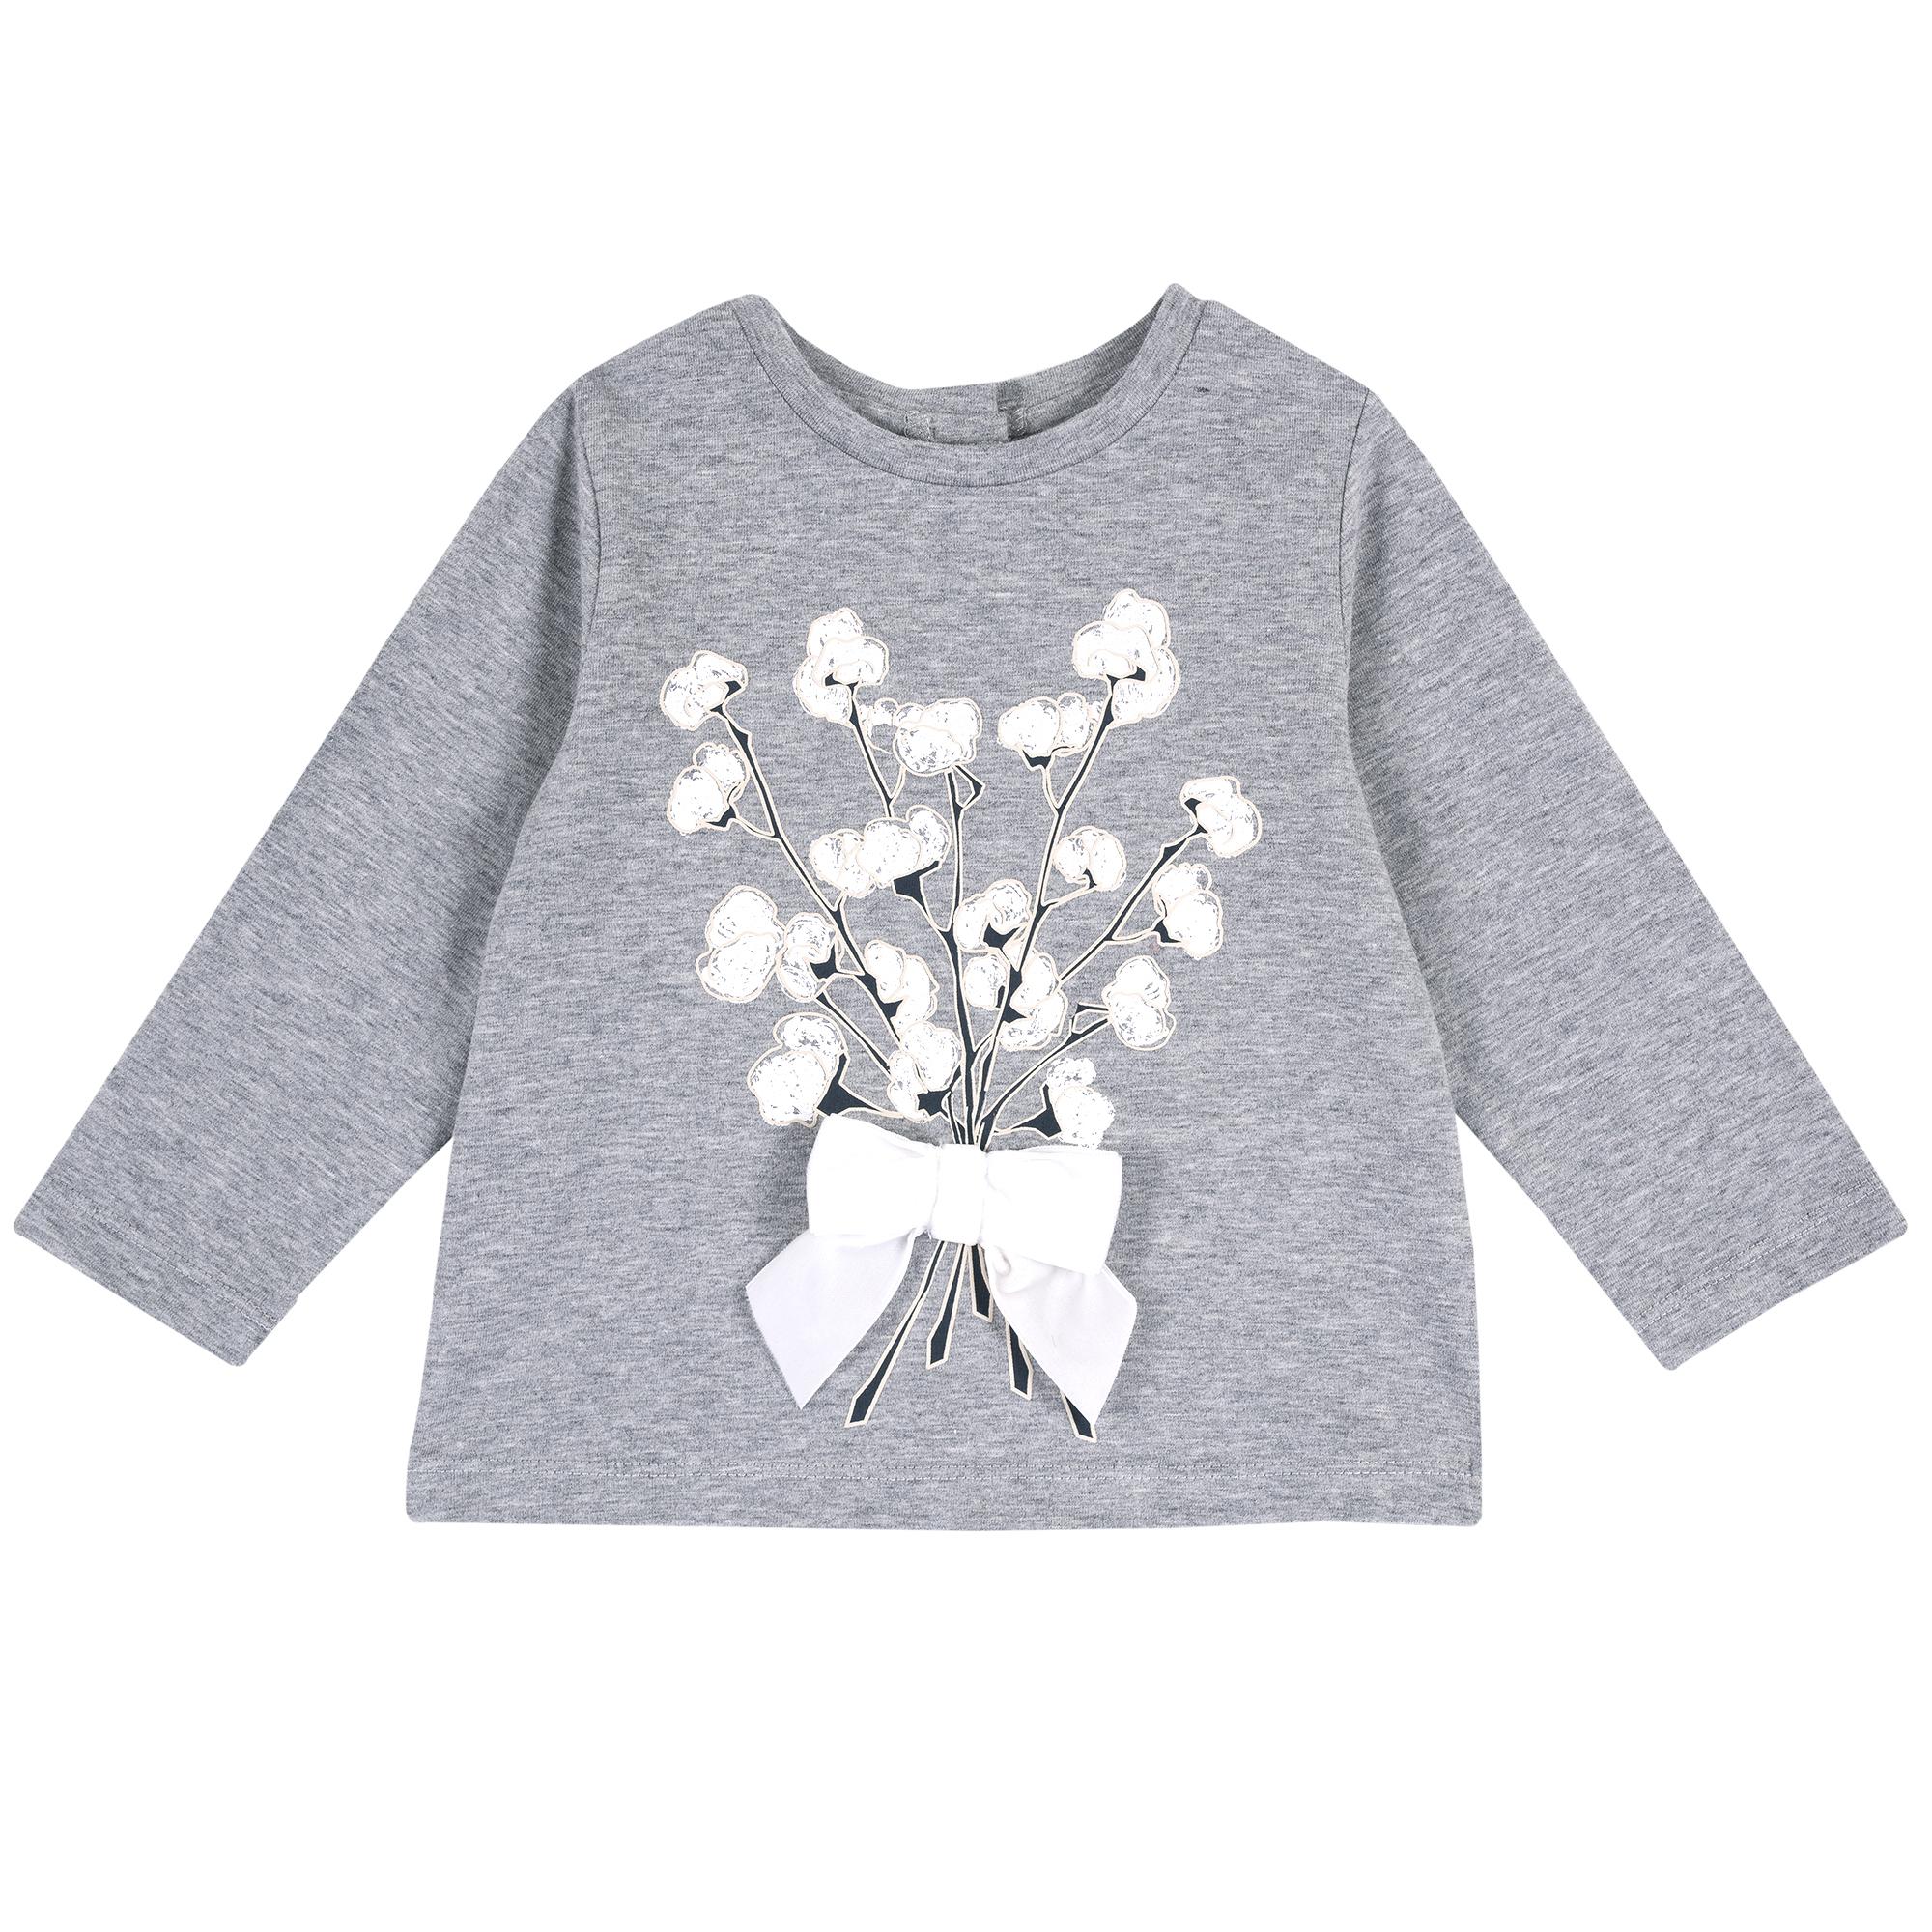 Tricou copii Chicco, maneca lunga, imprimeu flori de bumbac, 06808 din categoria Tricouri copii